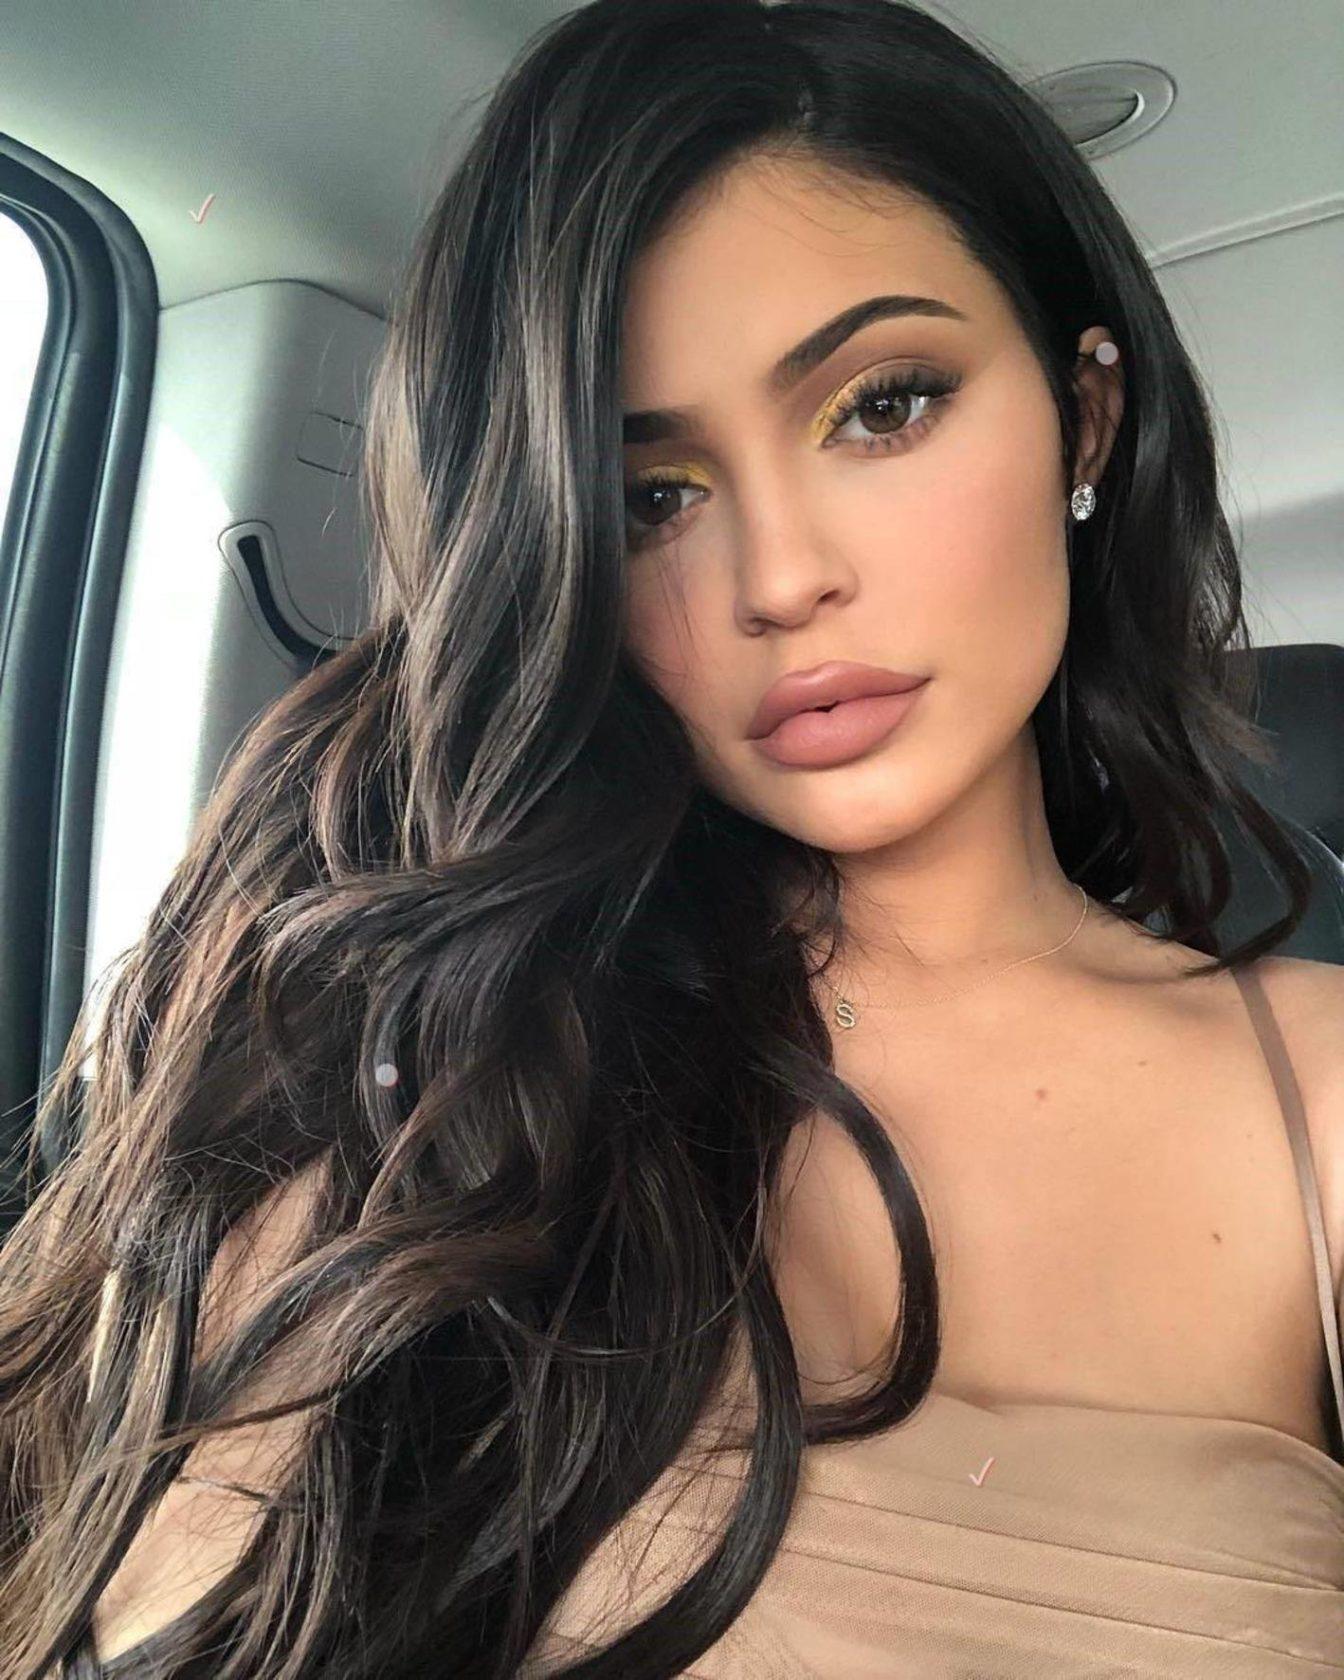 Kylie Jenner (kyliejenner / 18.05.2018): pop up